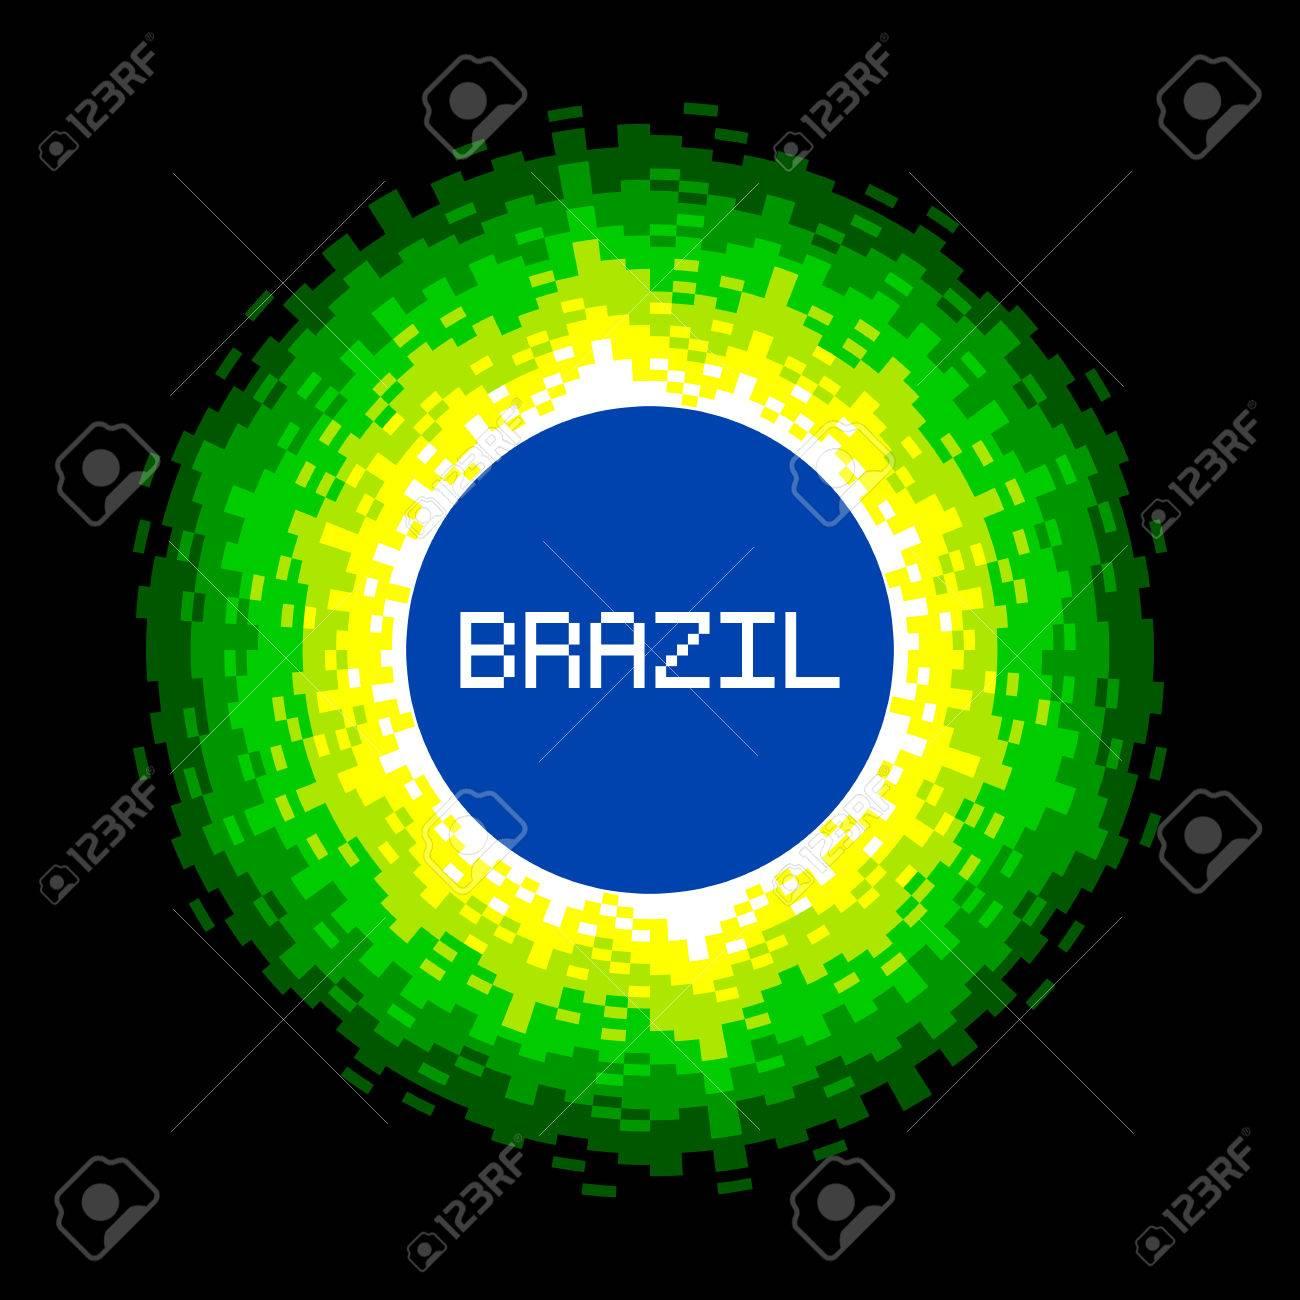 8-Bit Pixel-art Brazil World Concept. Stock Vector - 27463836